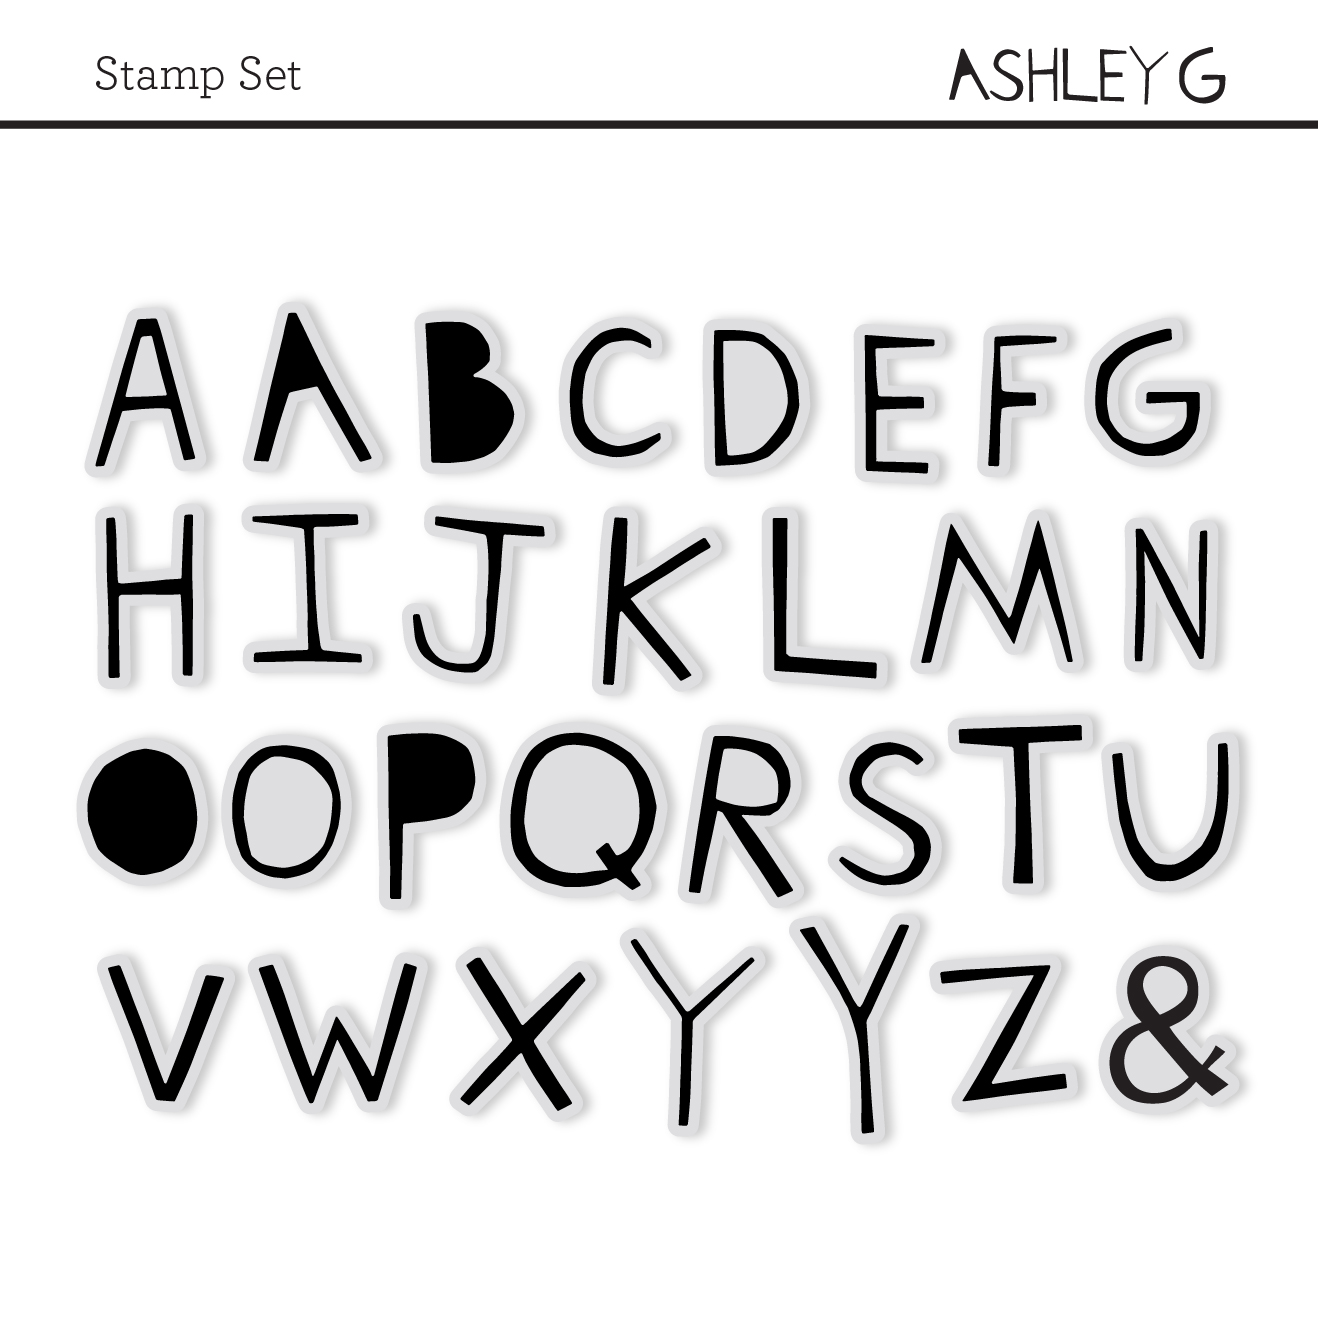 Ashley G Stamp Set for Studio Calico